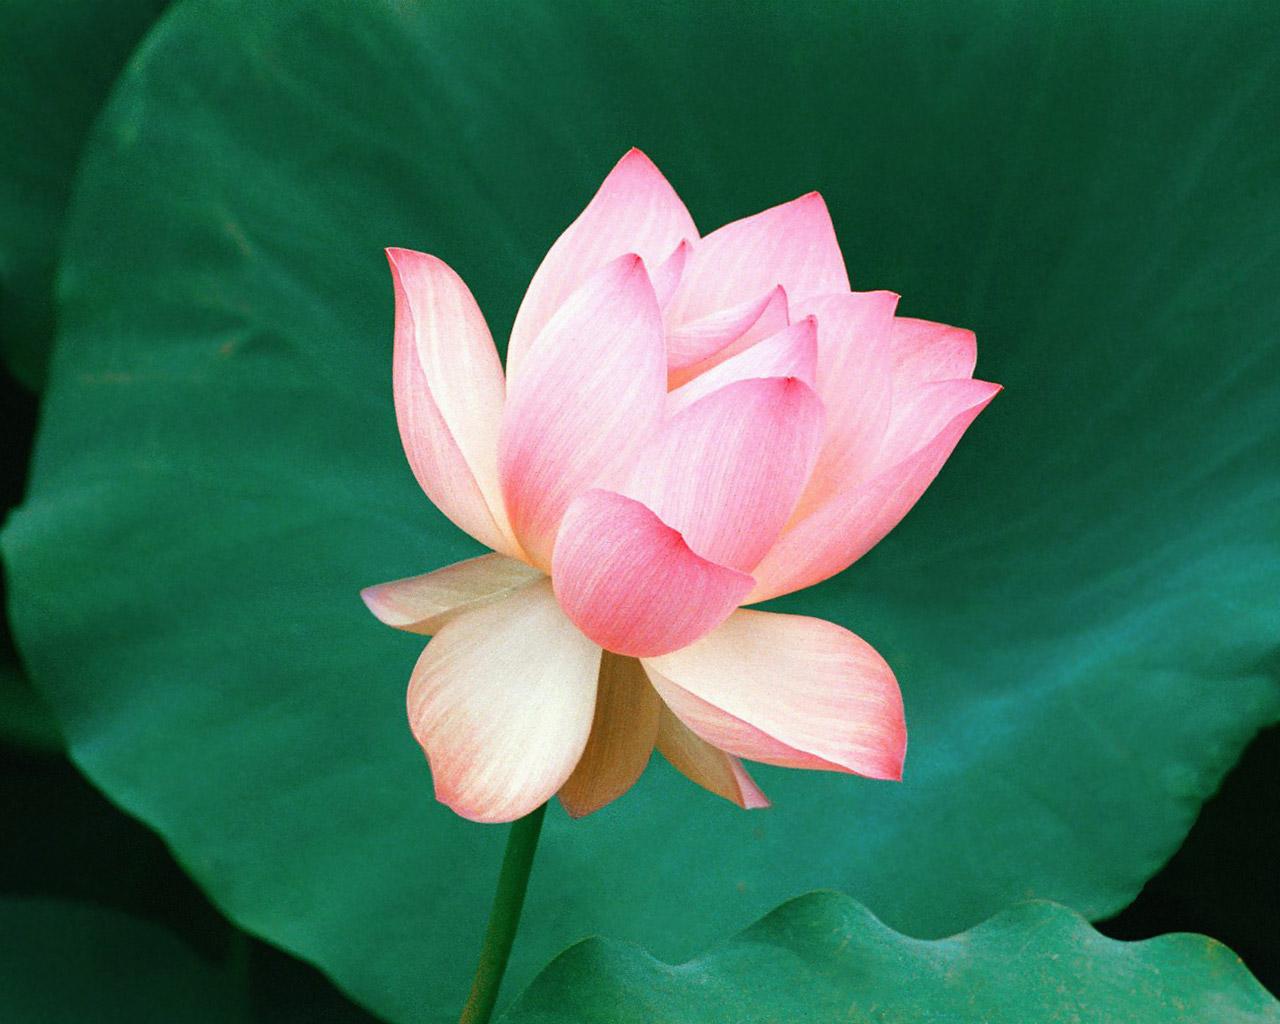 Rose flower essay in english